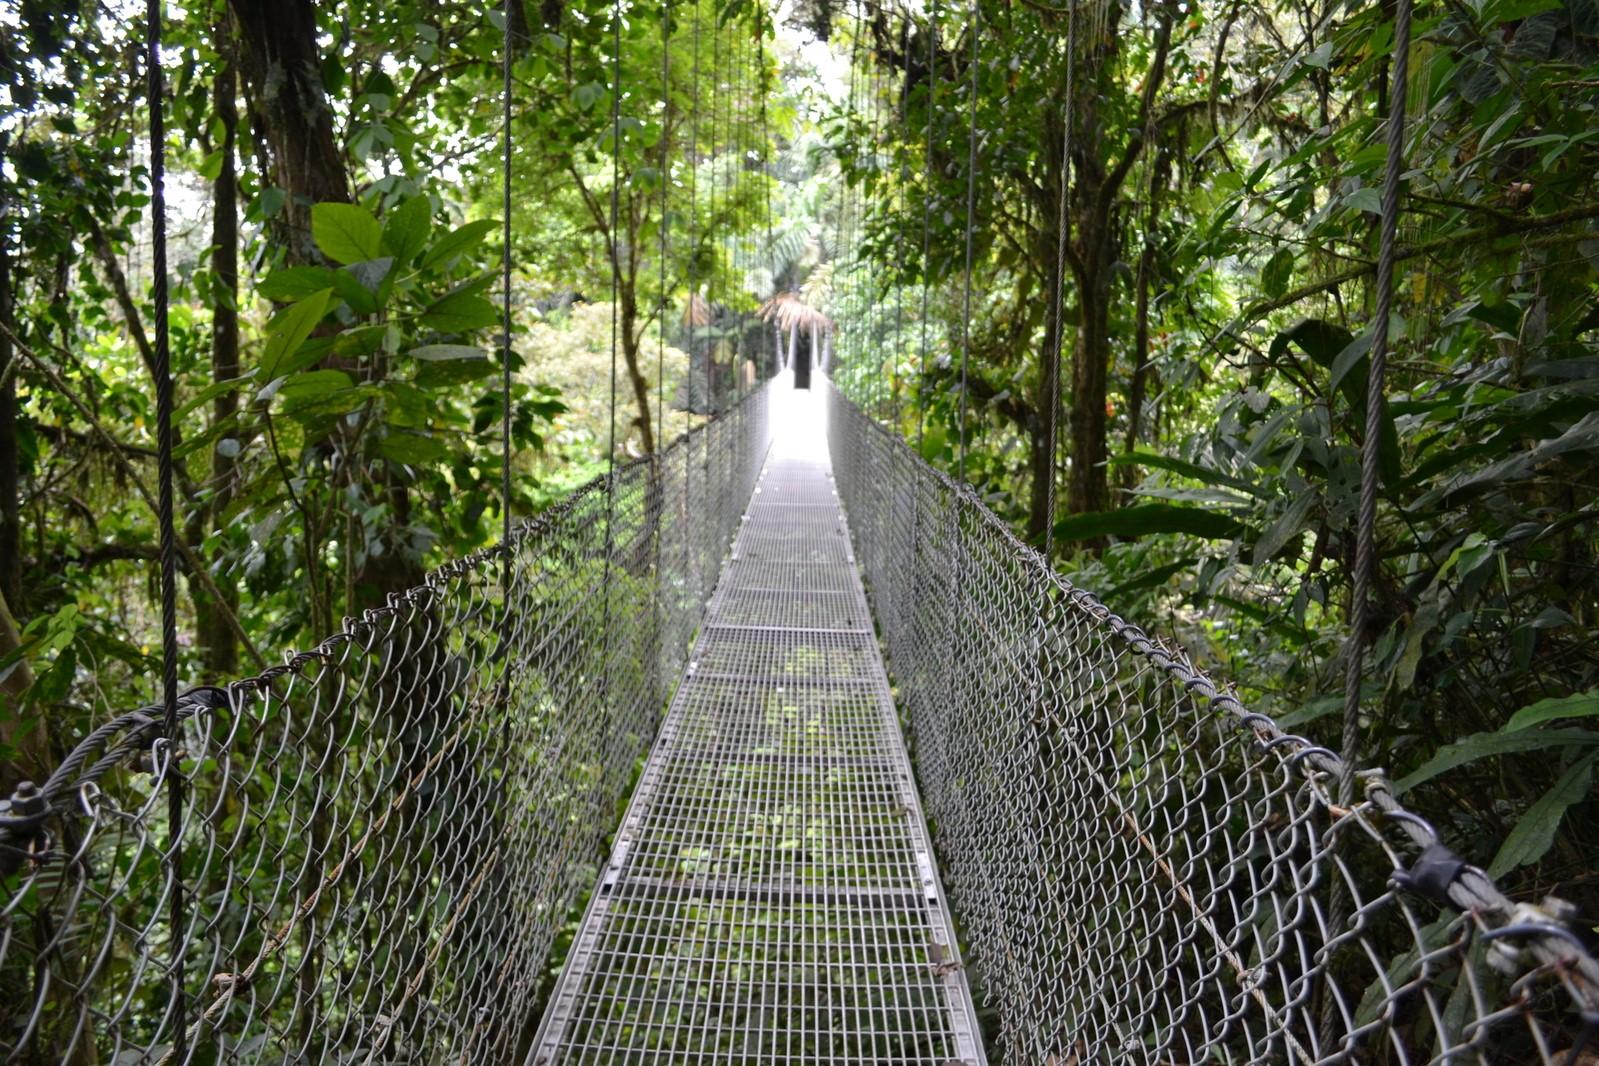 costa-rica_bridge-over-the-trees-1623067-1599x1066_freeimages